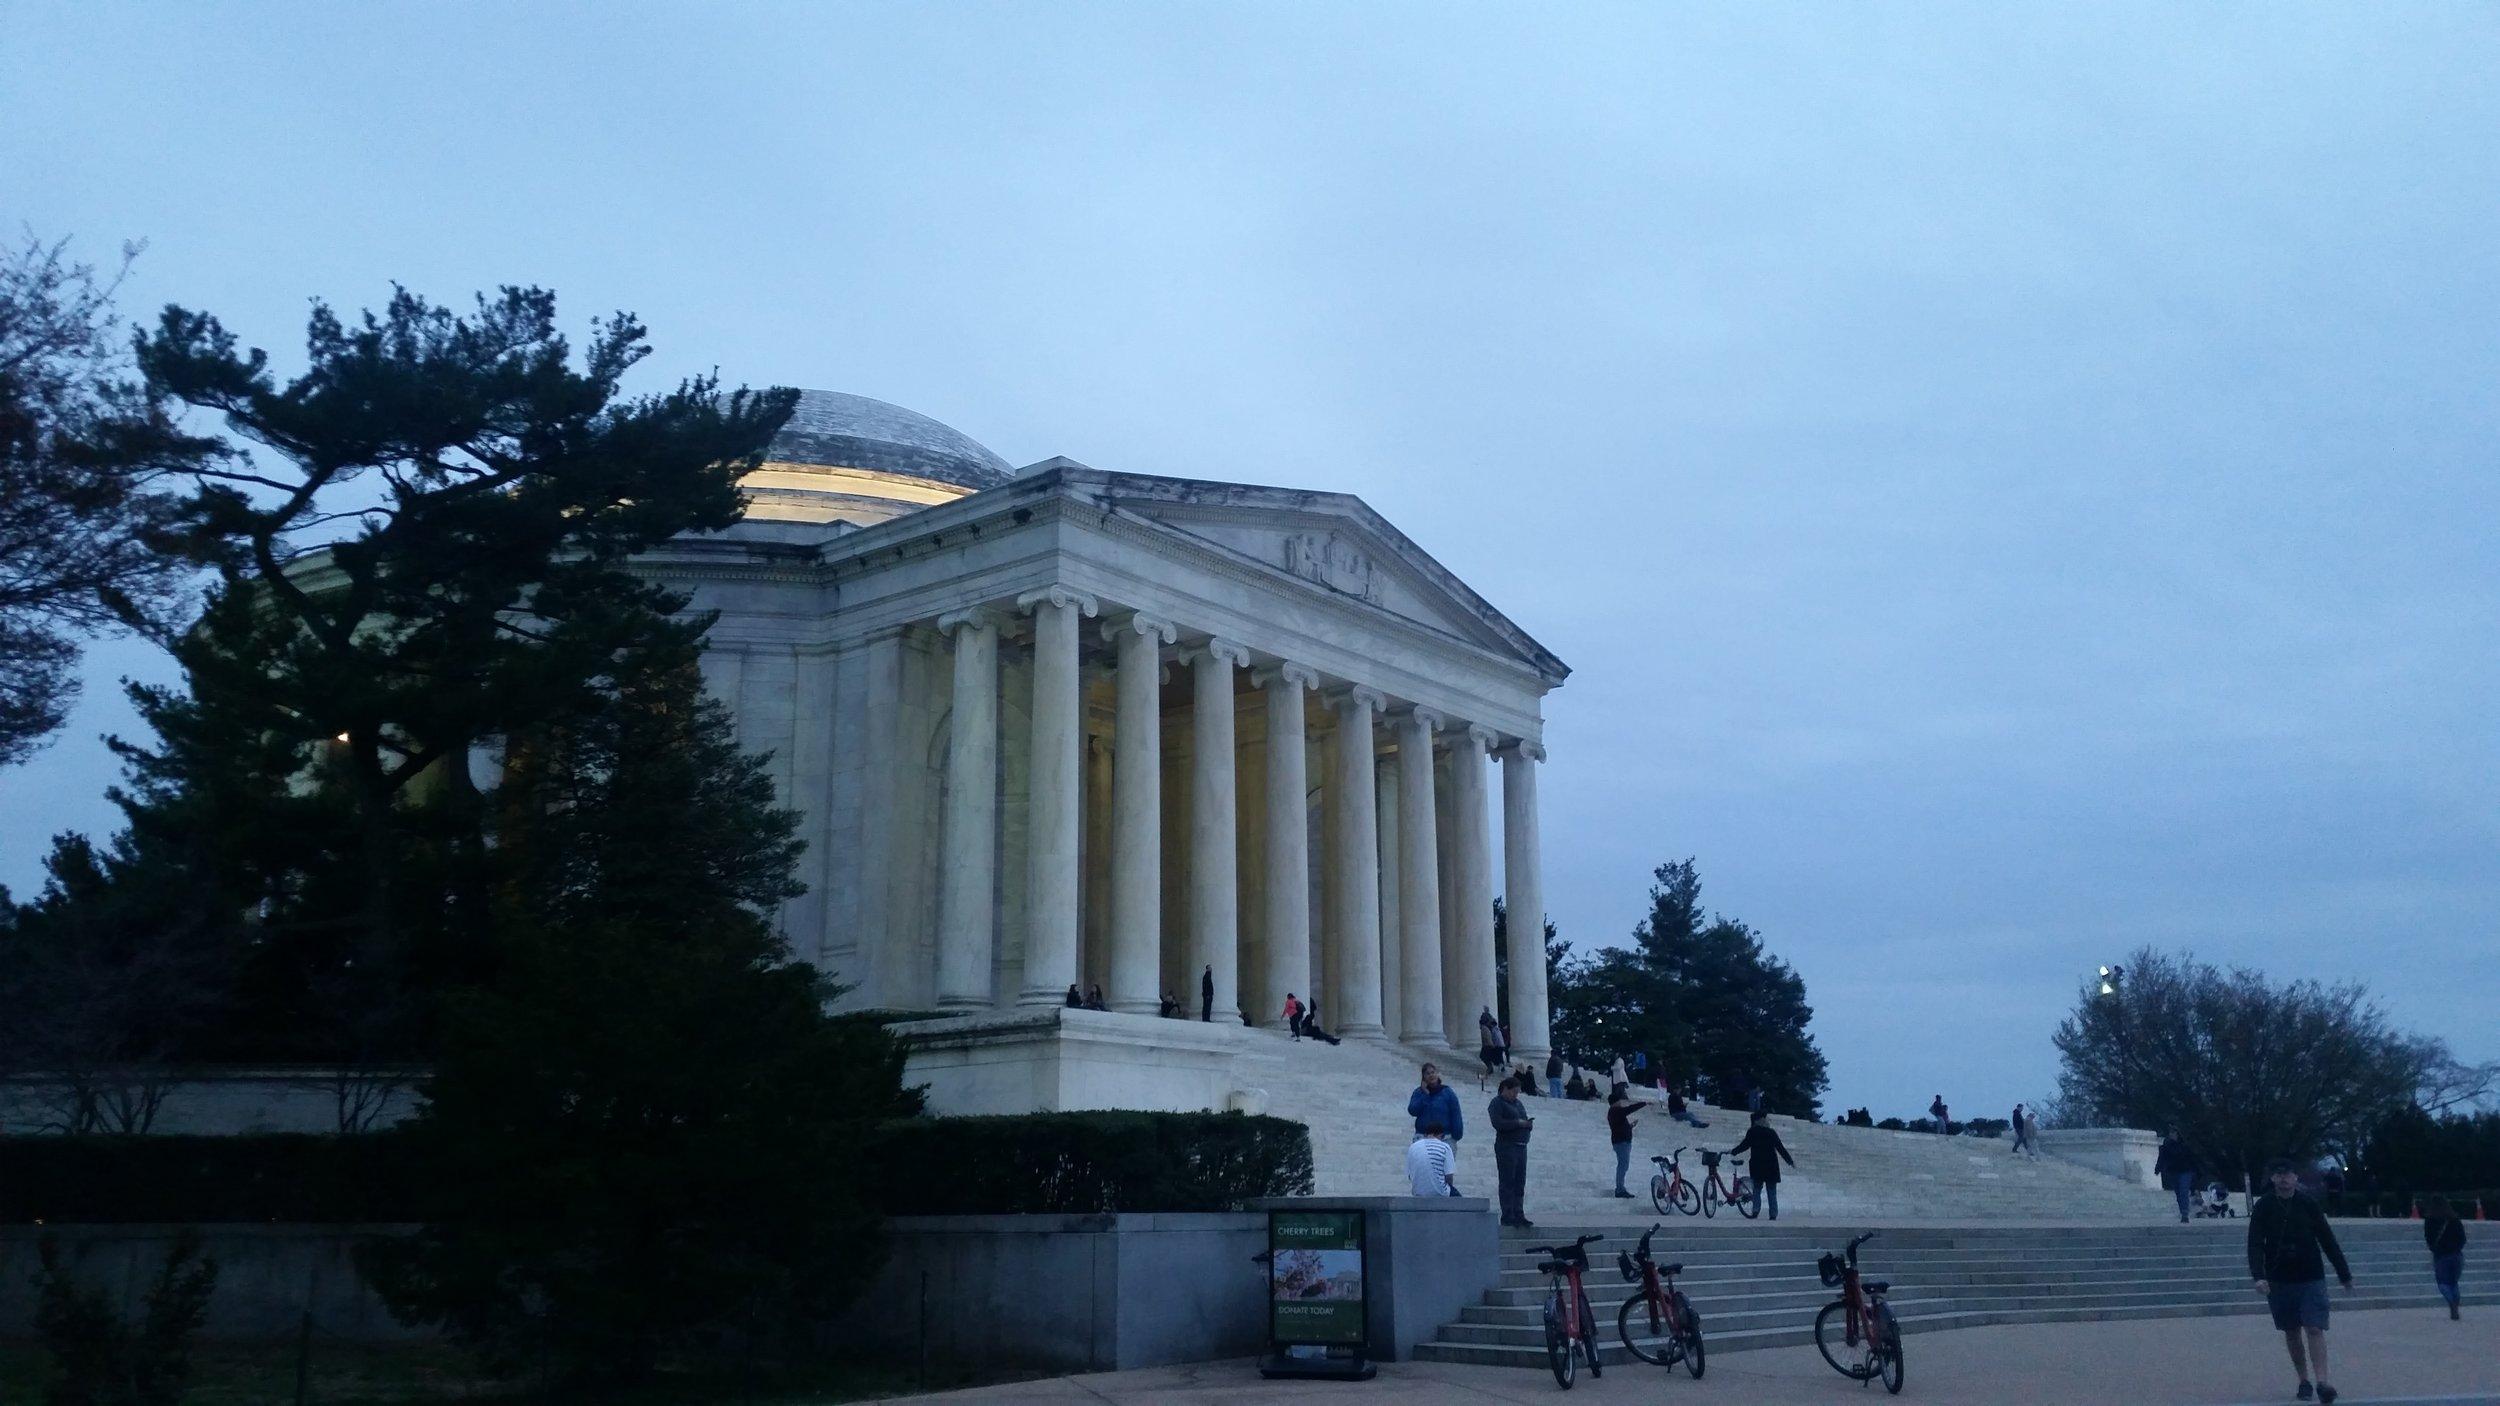 JeffersonMemorialWashingtonDC